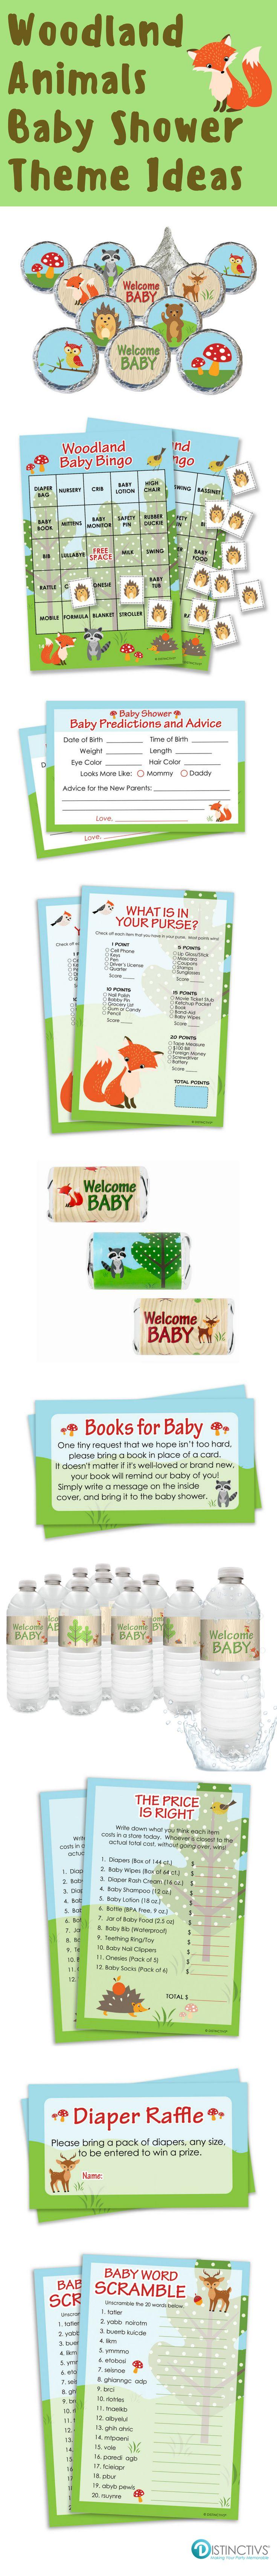 95 best Woodland Animals Baby Shower images on Pinterest